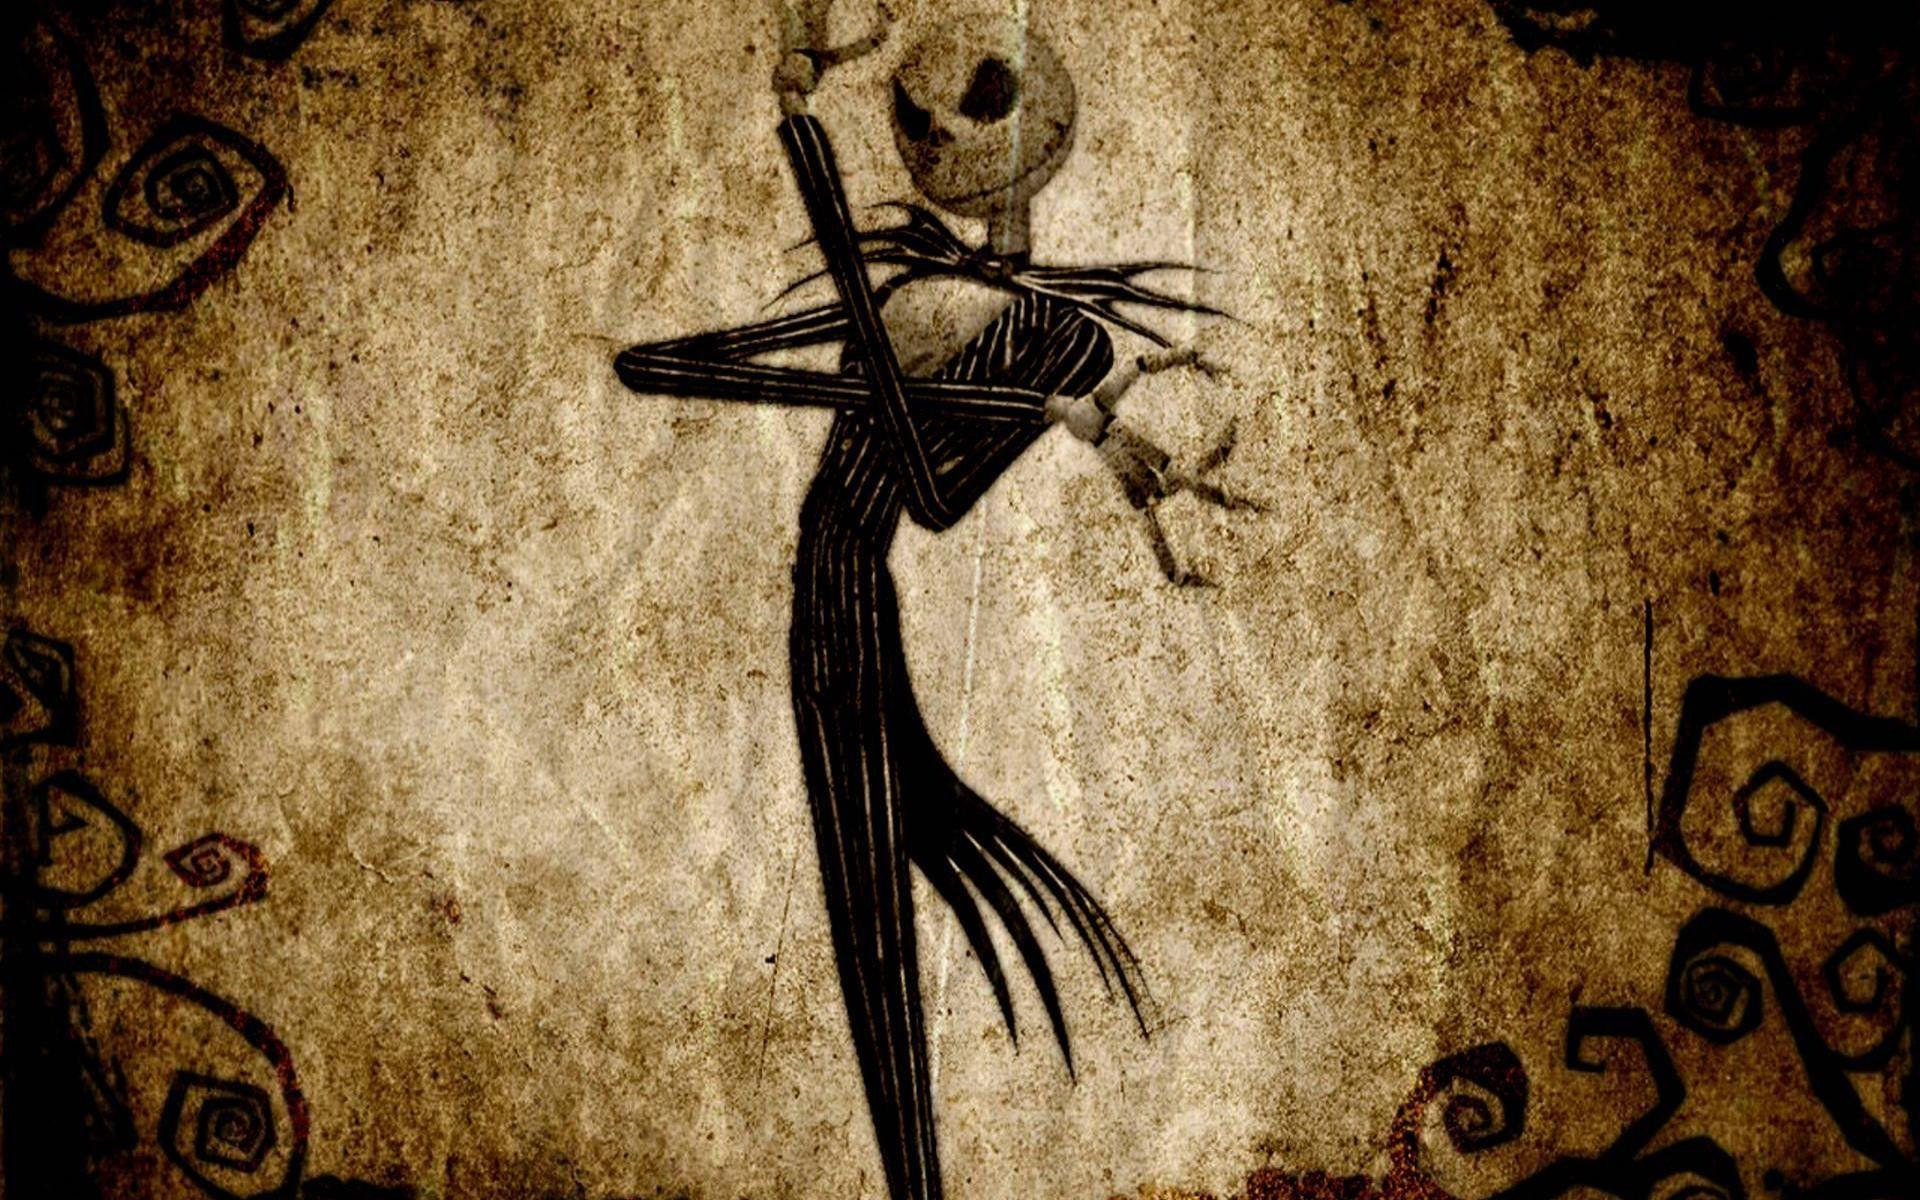 Tim Burton Wallpapers - Wallpaper Cave